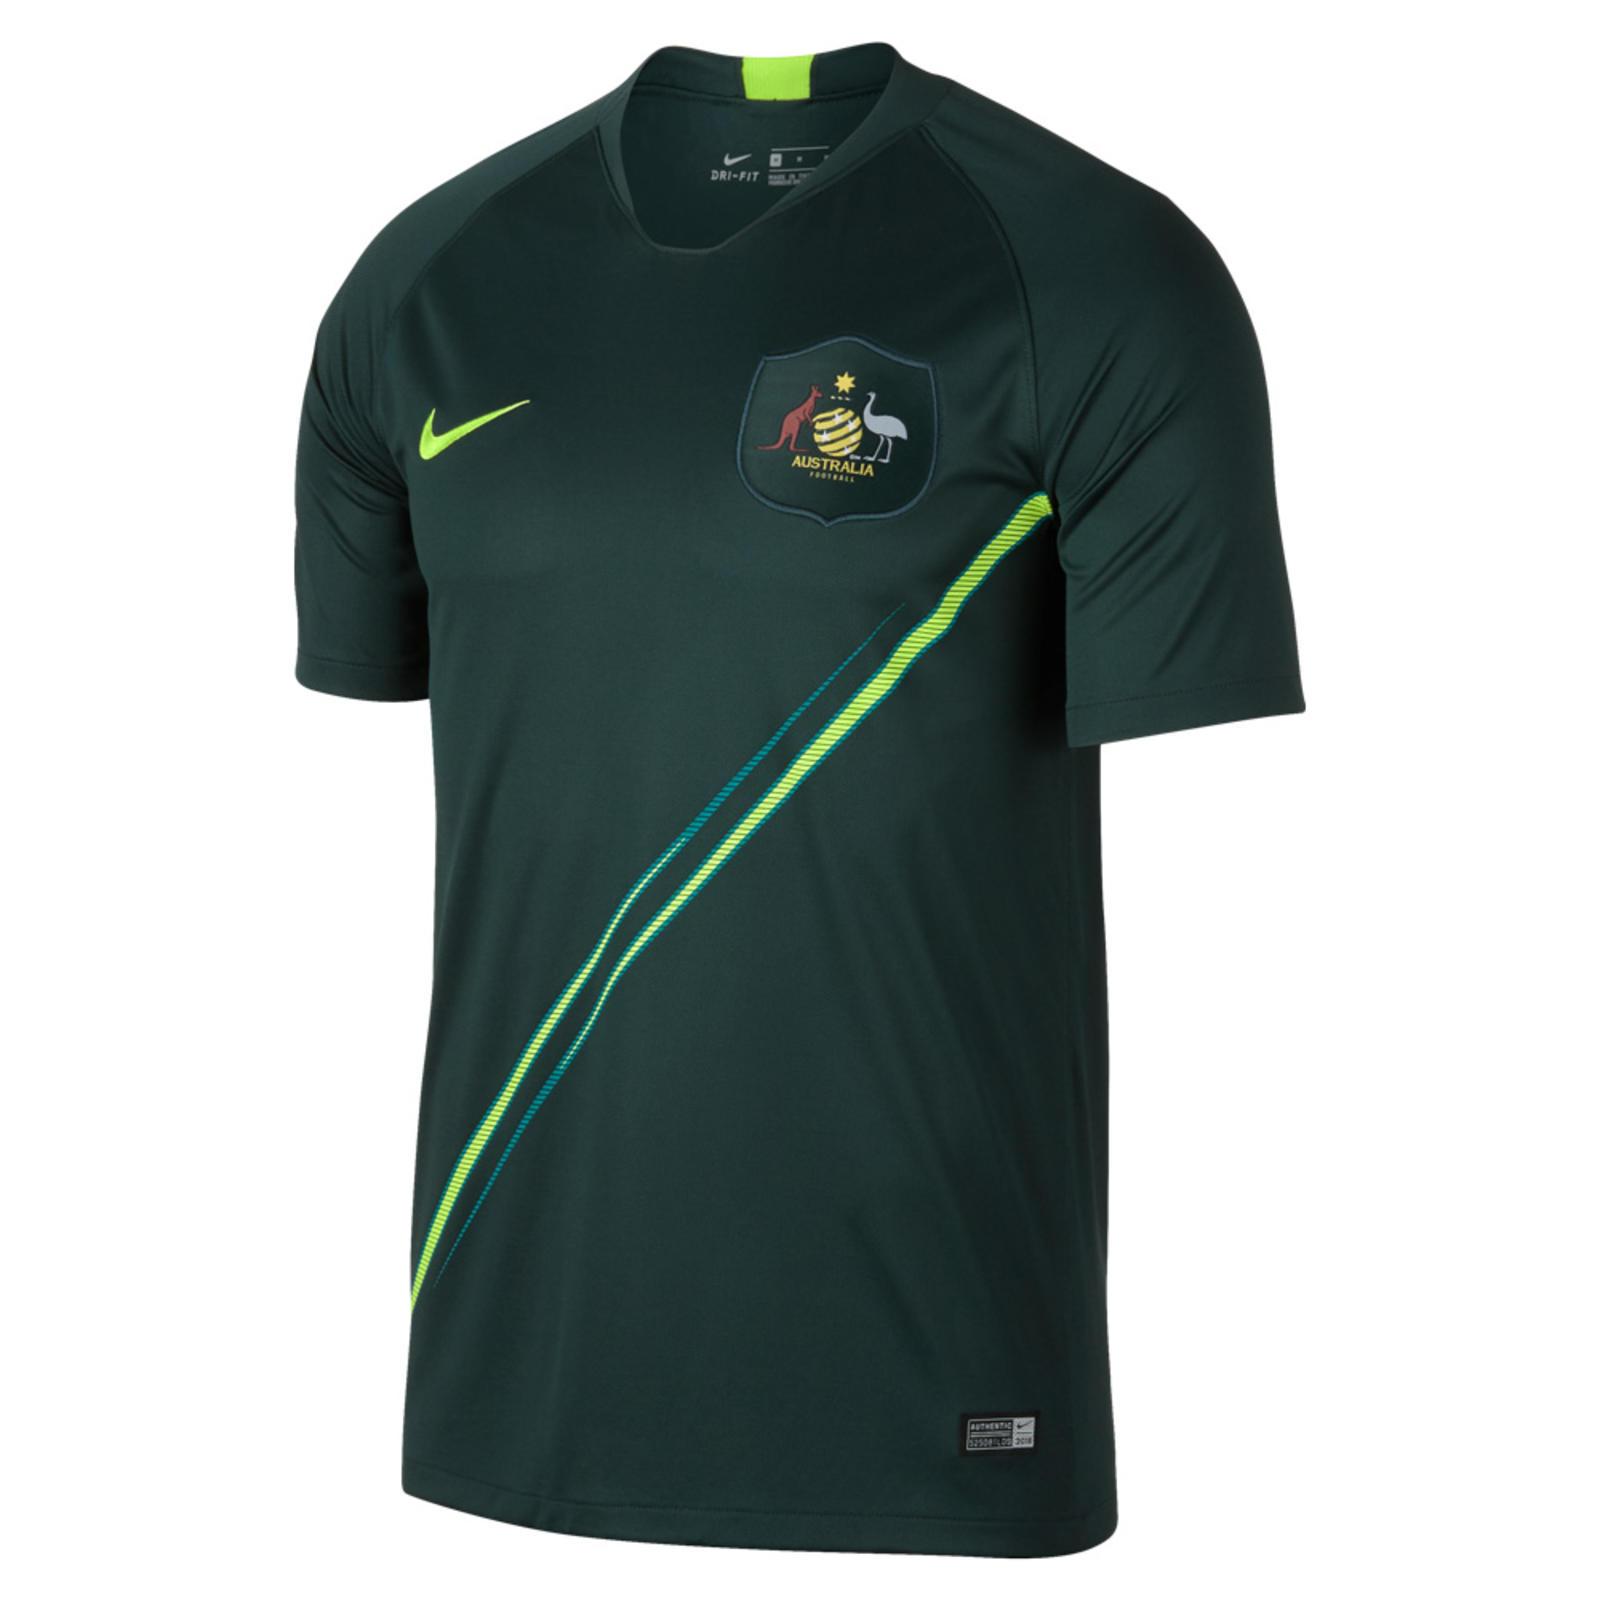 2018 Australia National Team Collection - Nike News ebda2de037262